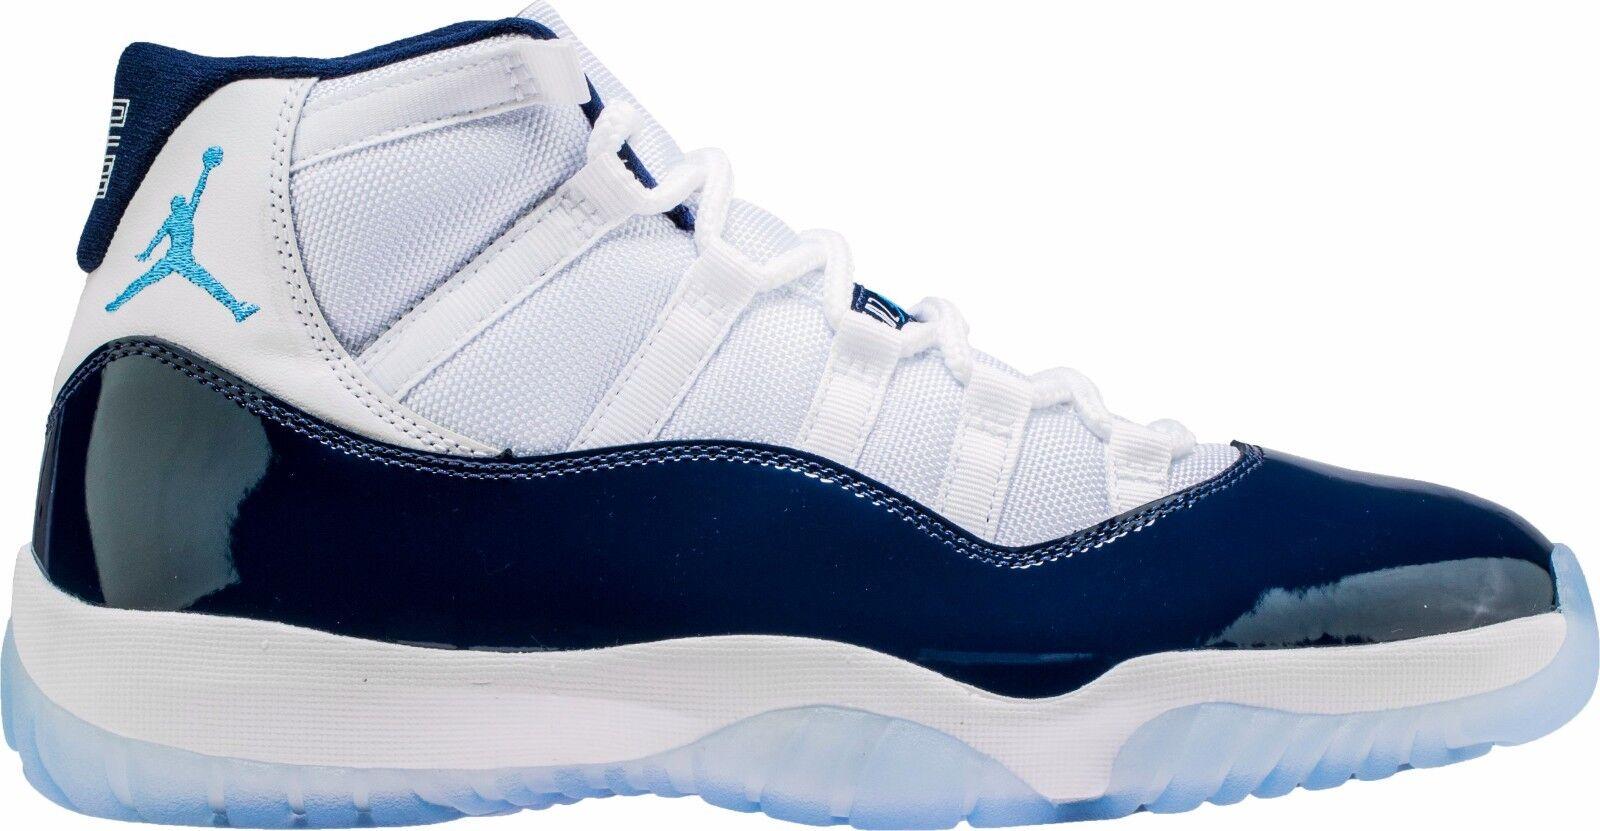 8d081965ab19 Air Jordan 11 Win Like 82 XI Retro UNC Midnight Navy Blue White 378037 123  아이템 넘버  132386908137.